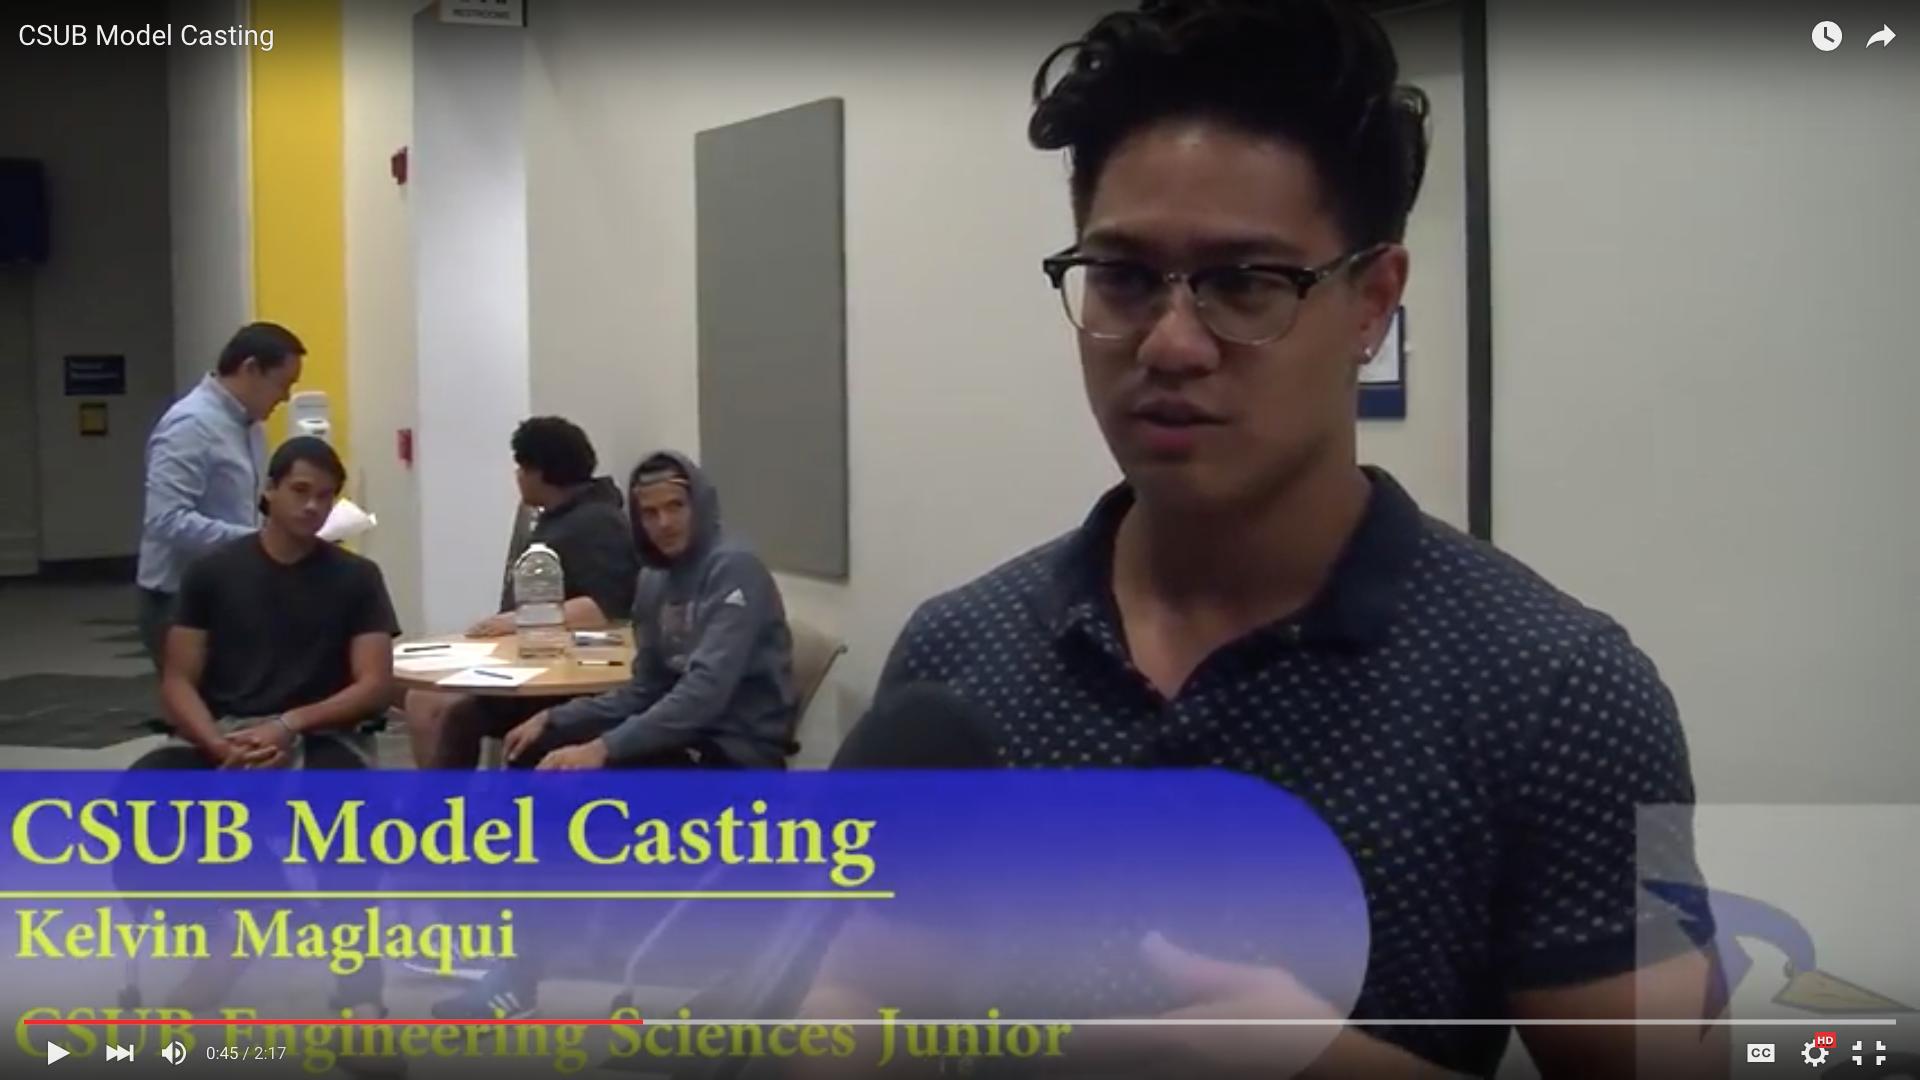 CSUB Model Casting